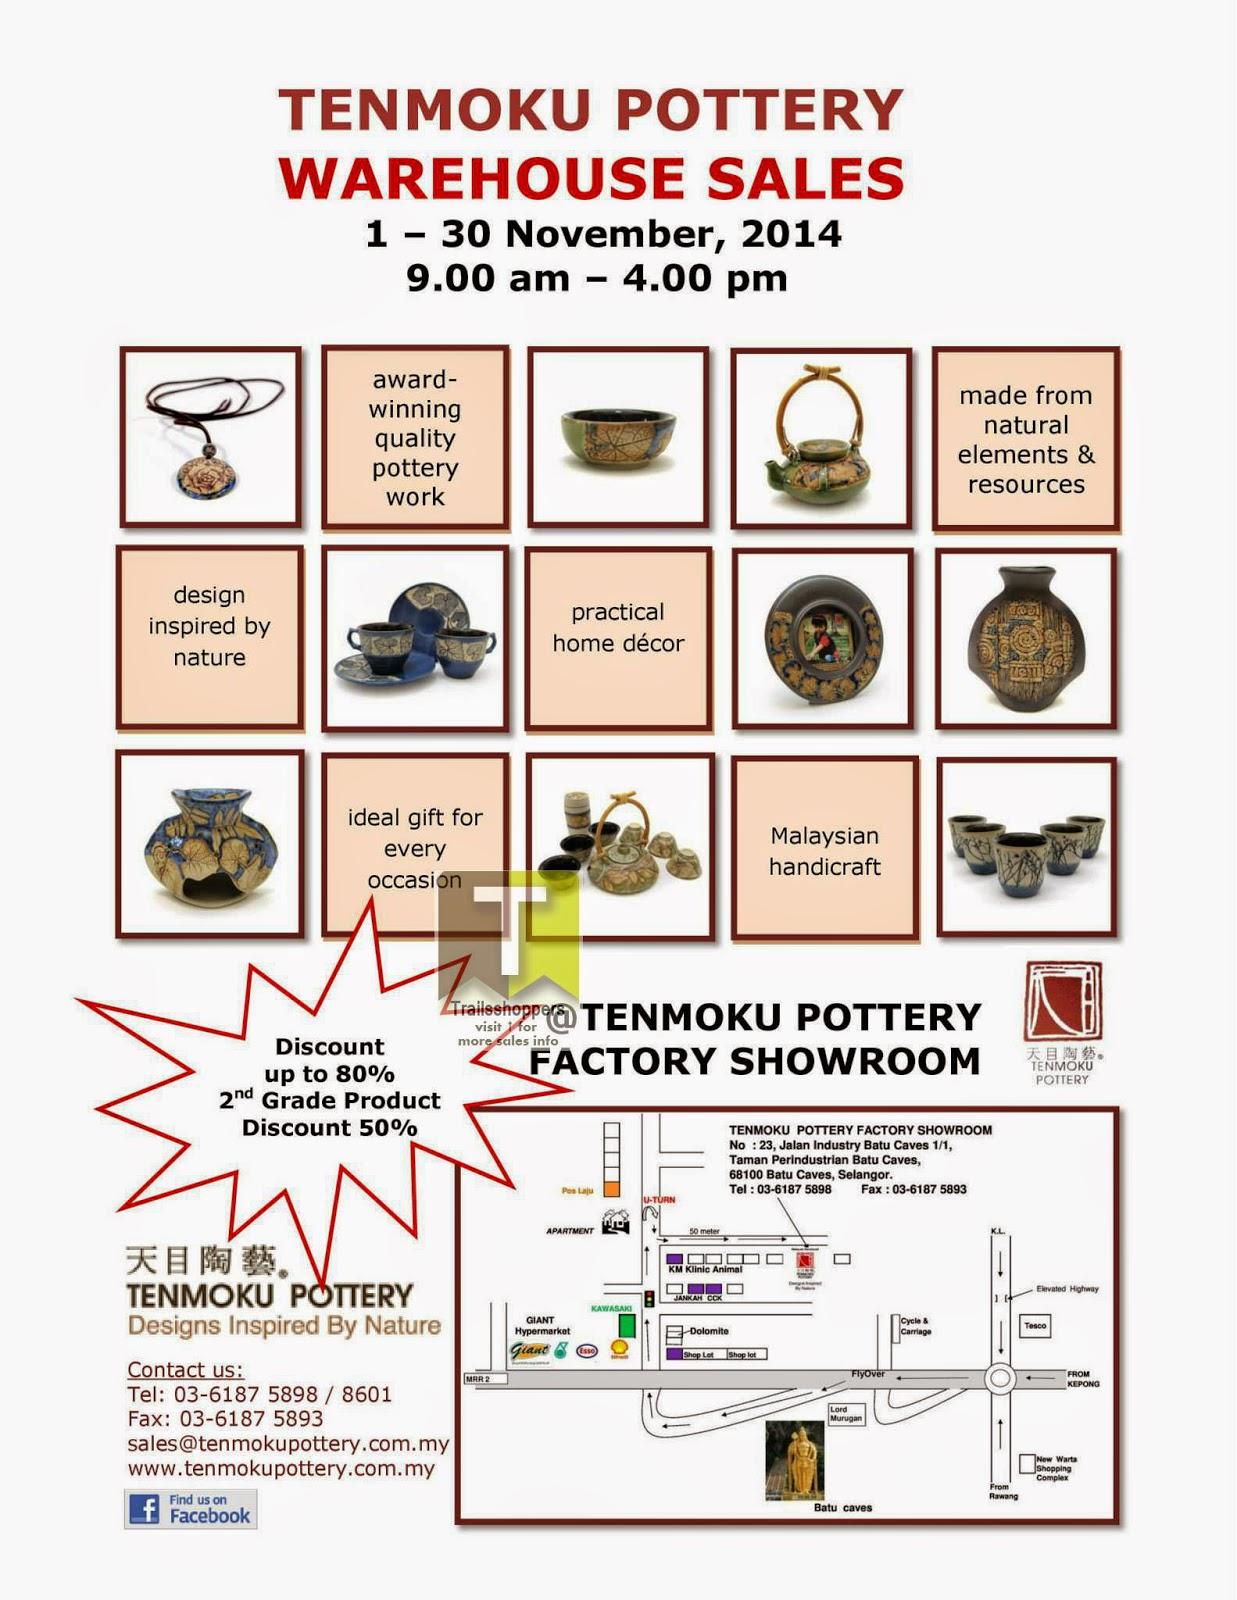 Tenmoku Pottery Warehouse Sale offers